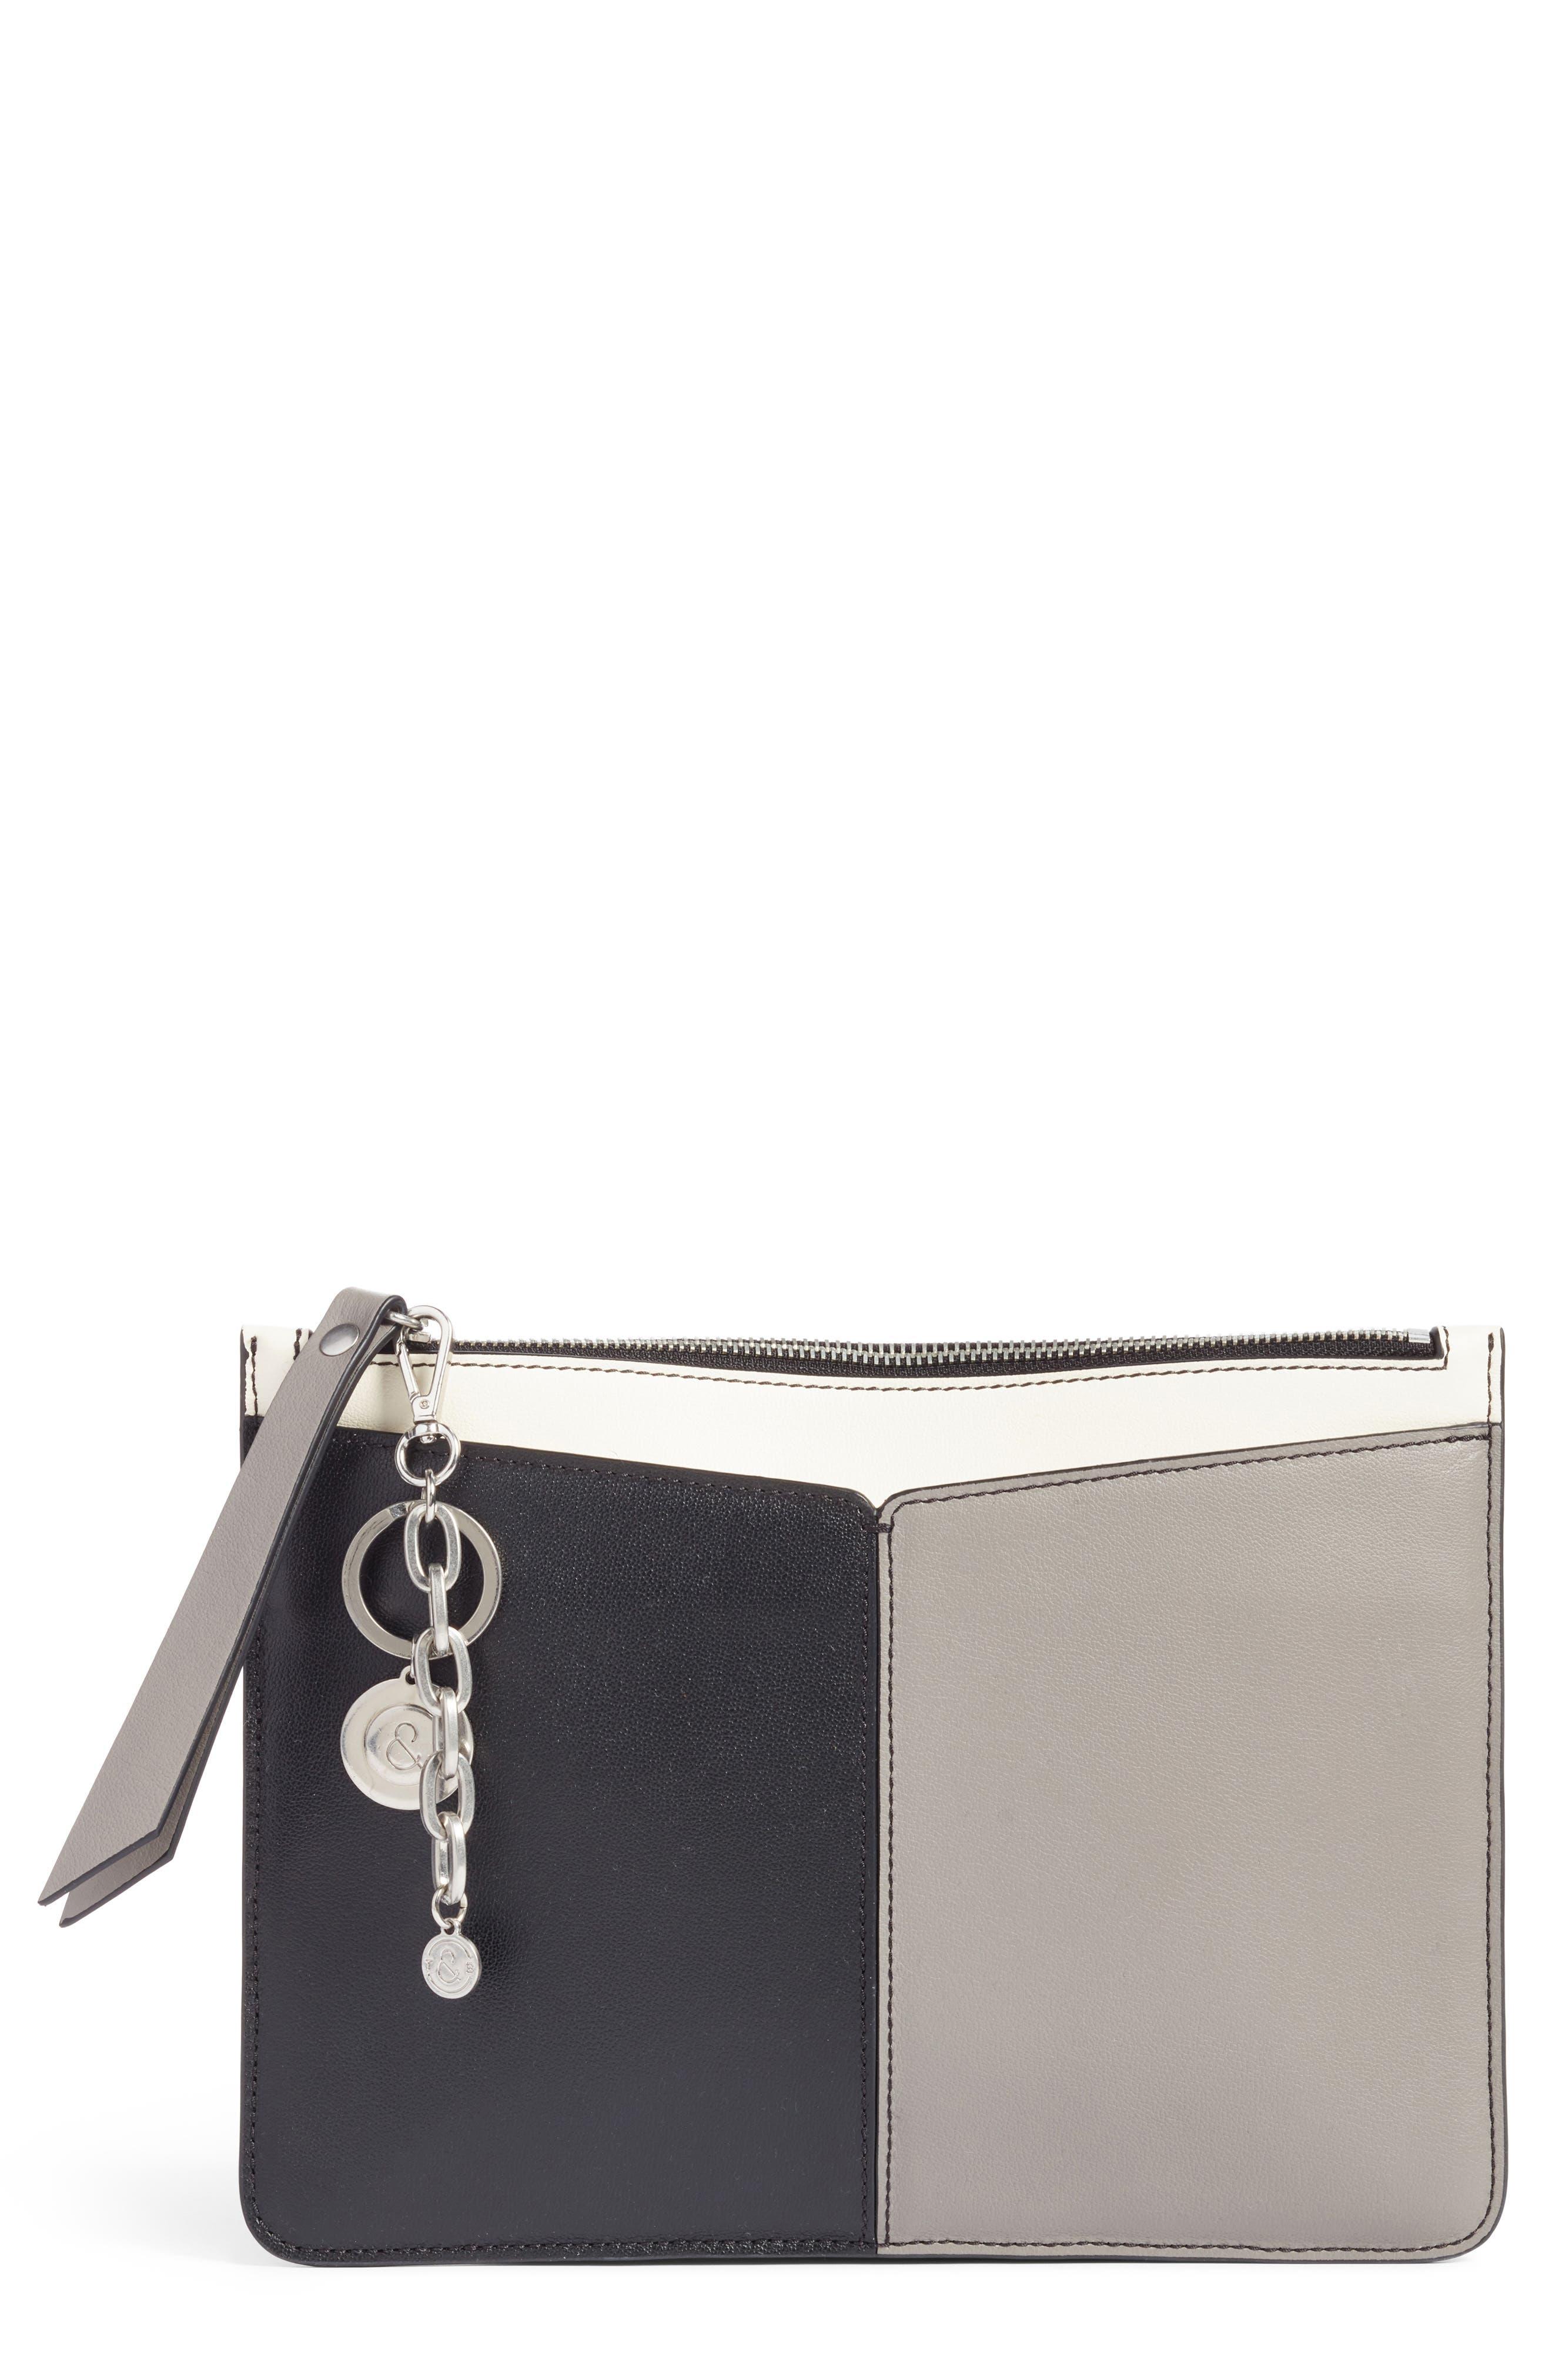 Treasure & Bond Beckett Colorblock Leather Pouch